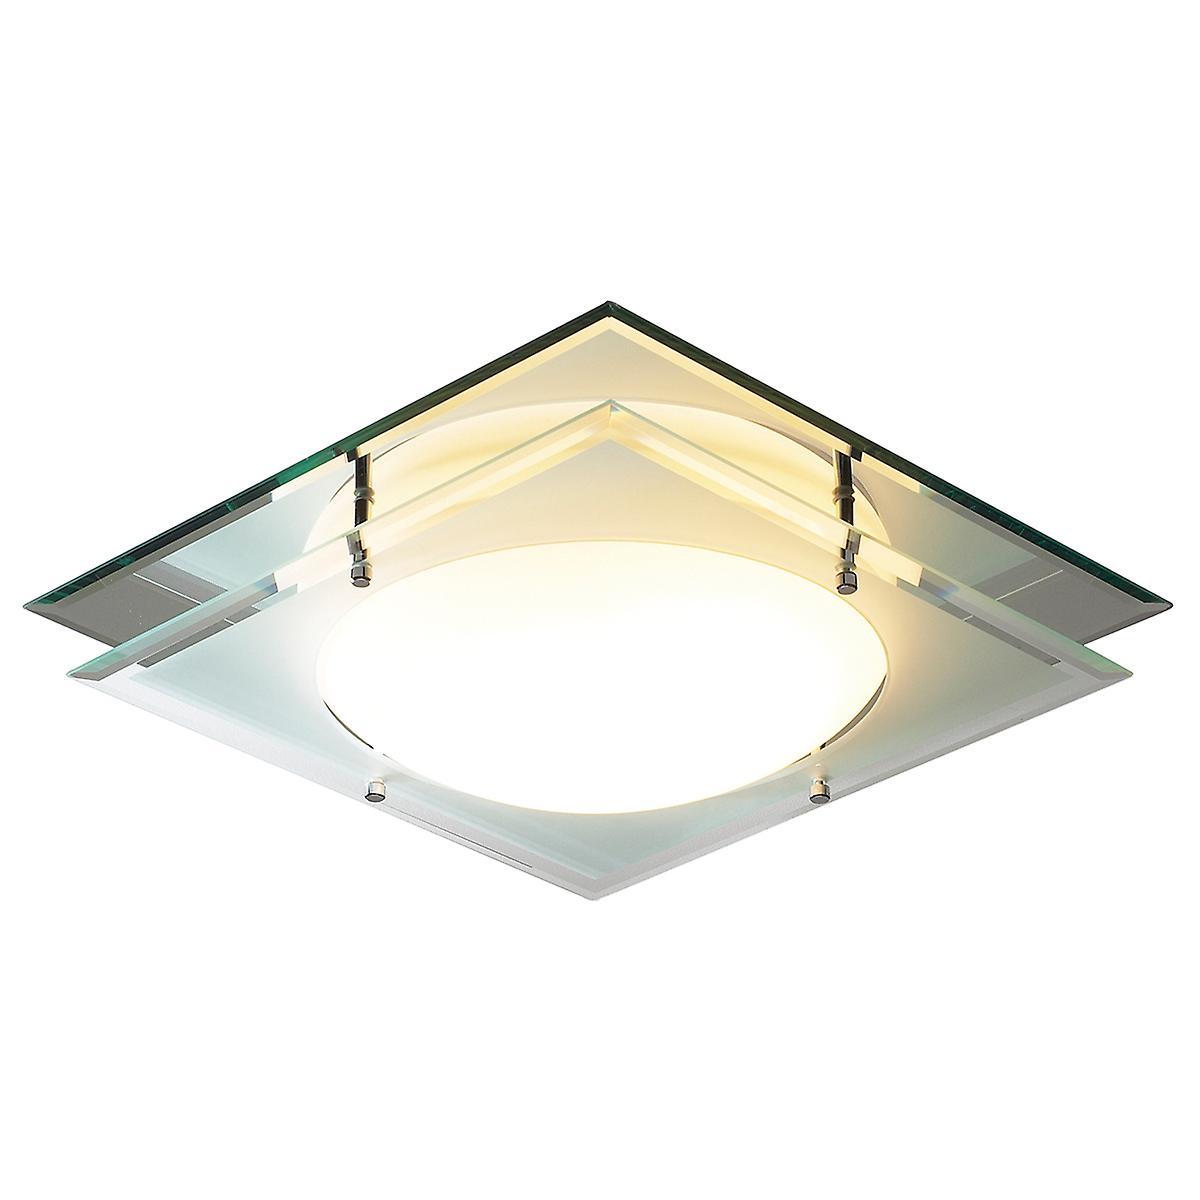 Dar MAN472 Mantra Mirrored Bathroom Flush Ceiling Light